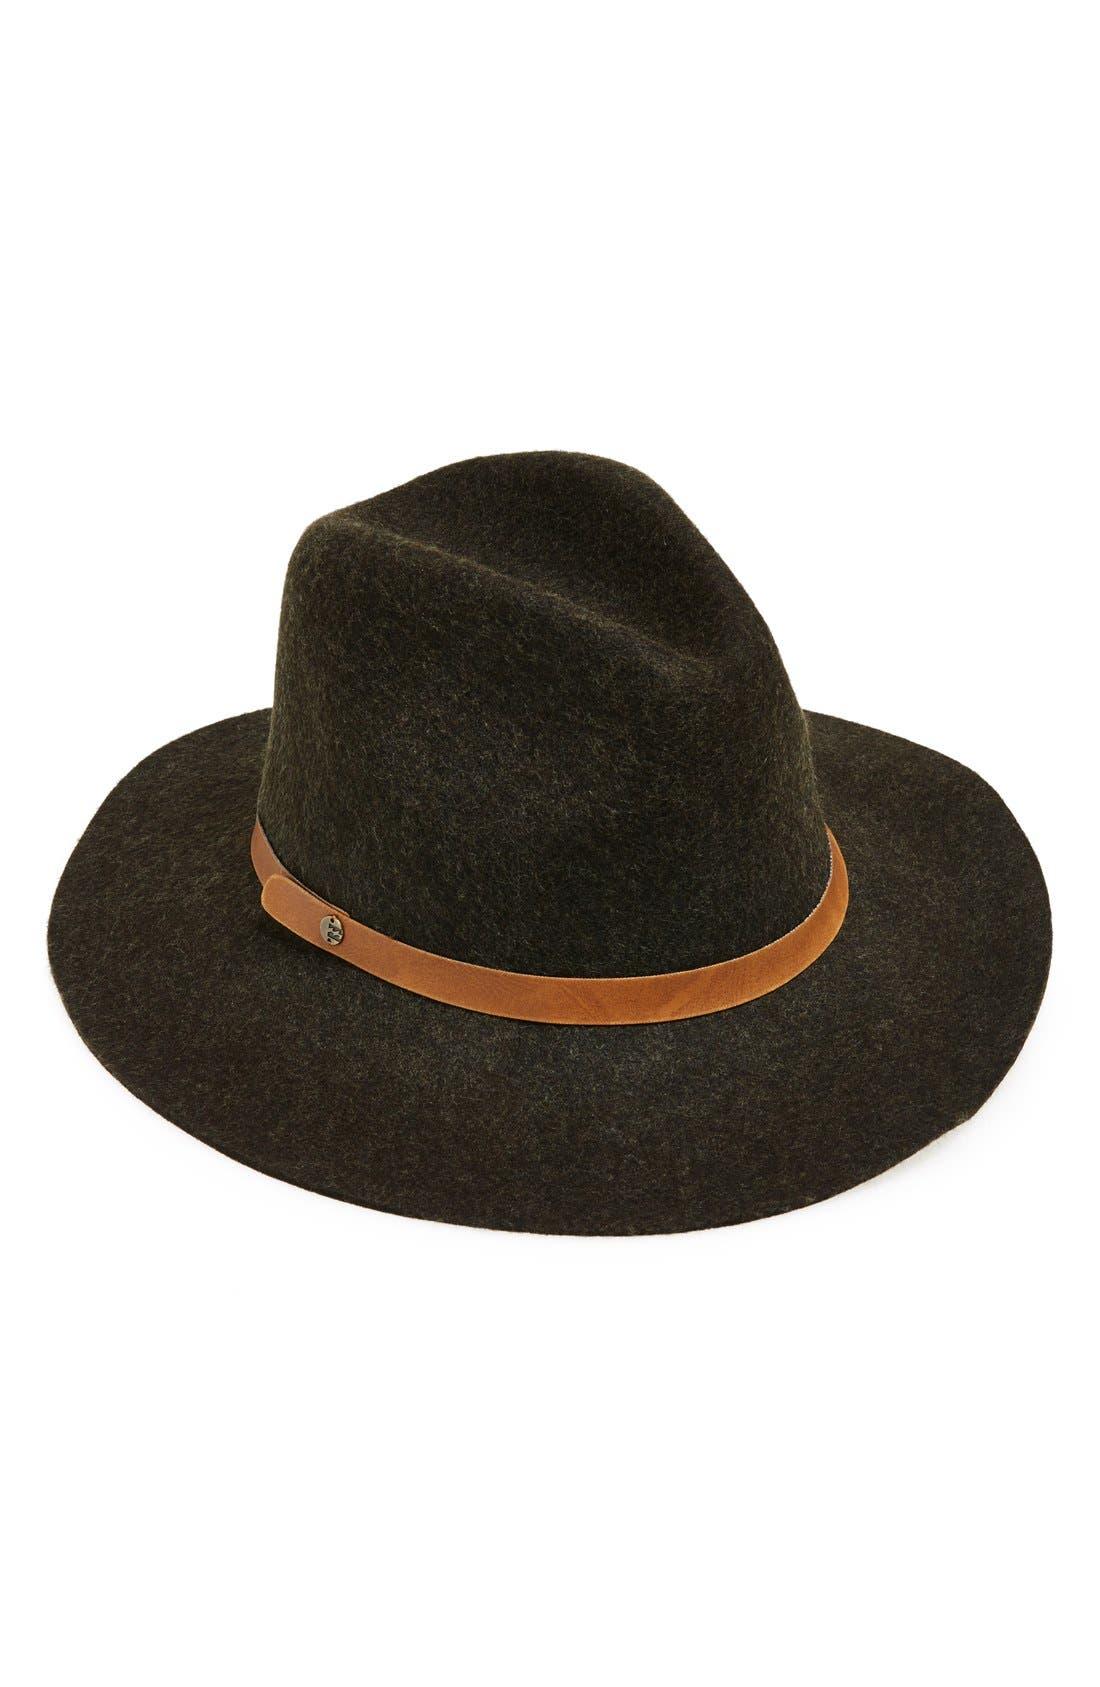 Alternate Image 1 Selected - Billabong 'Better Over Here' Panama Hat